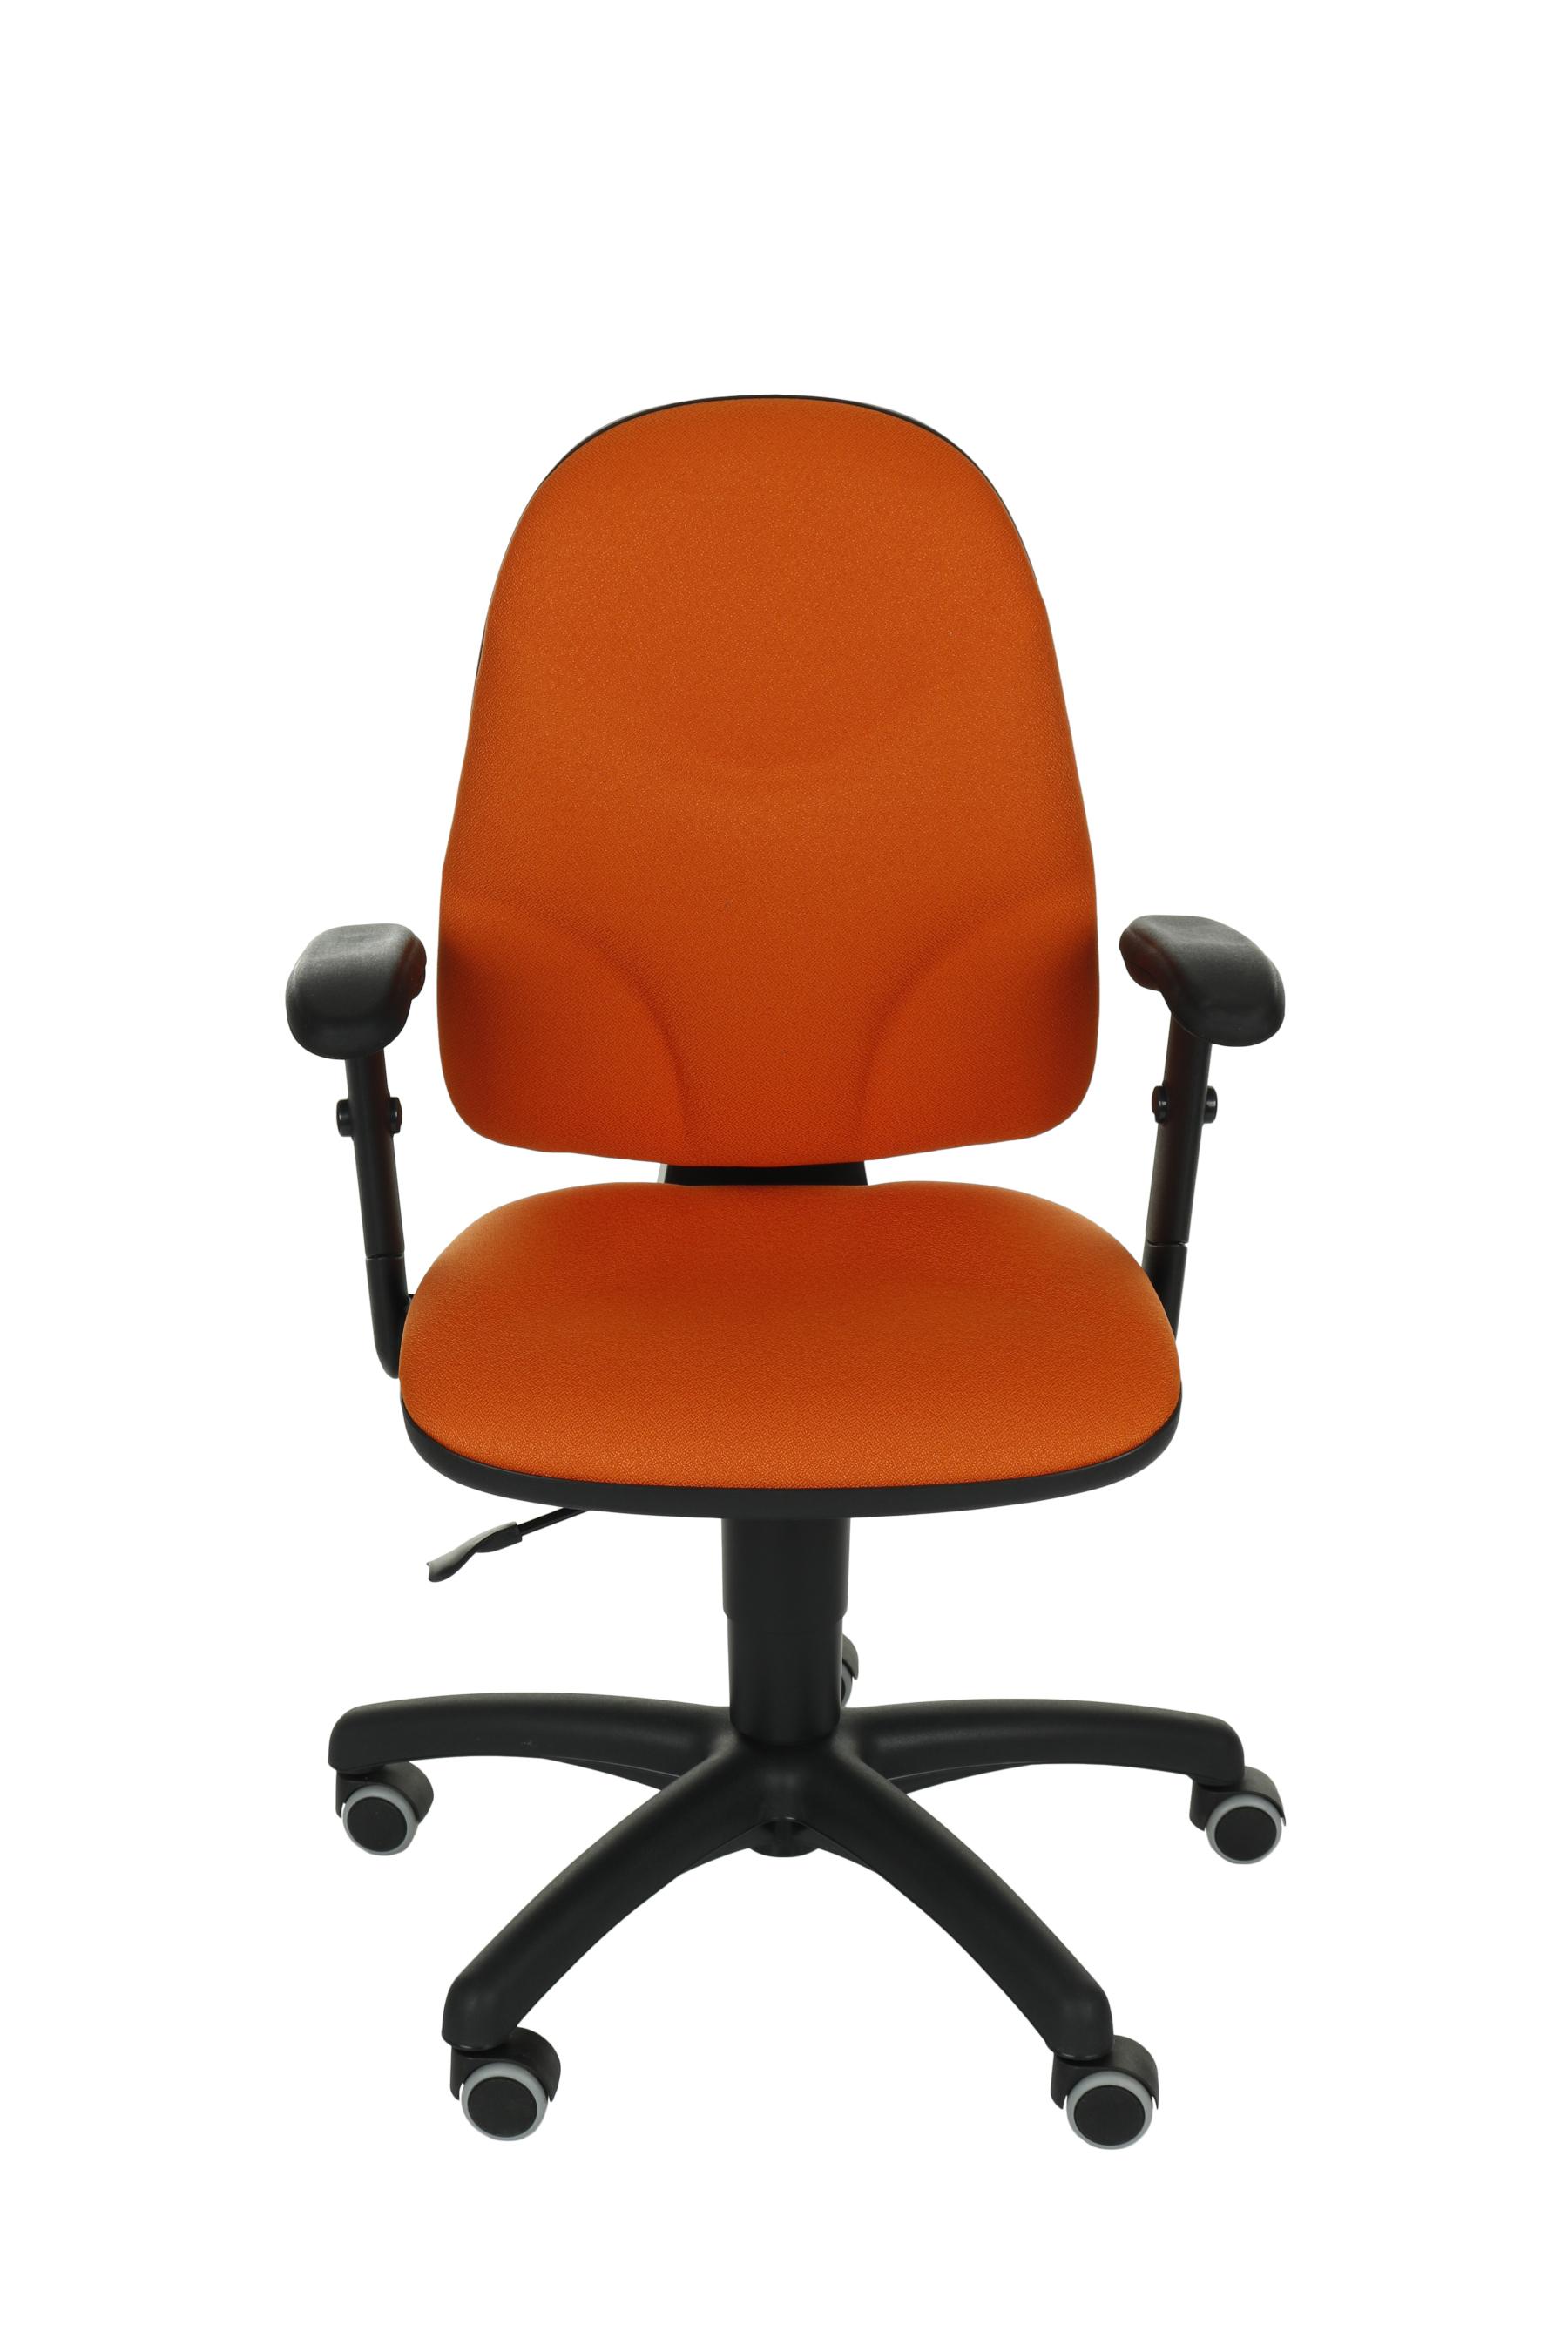 Krzesło Webst@r R YB130 OUTLET